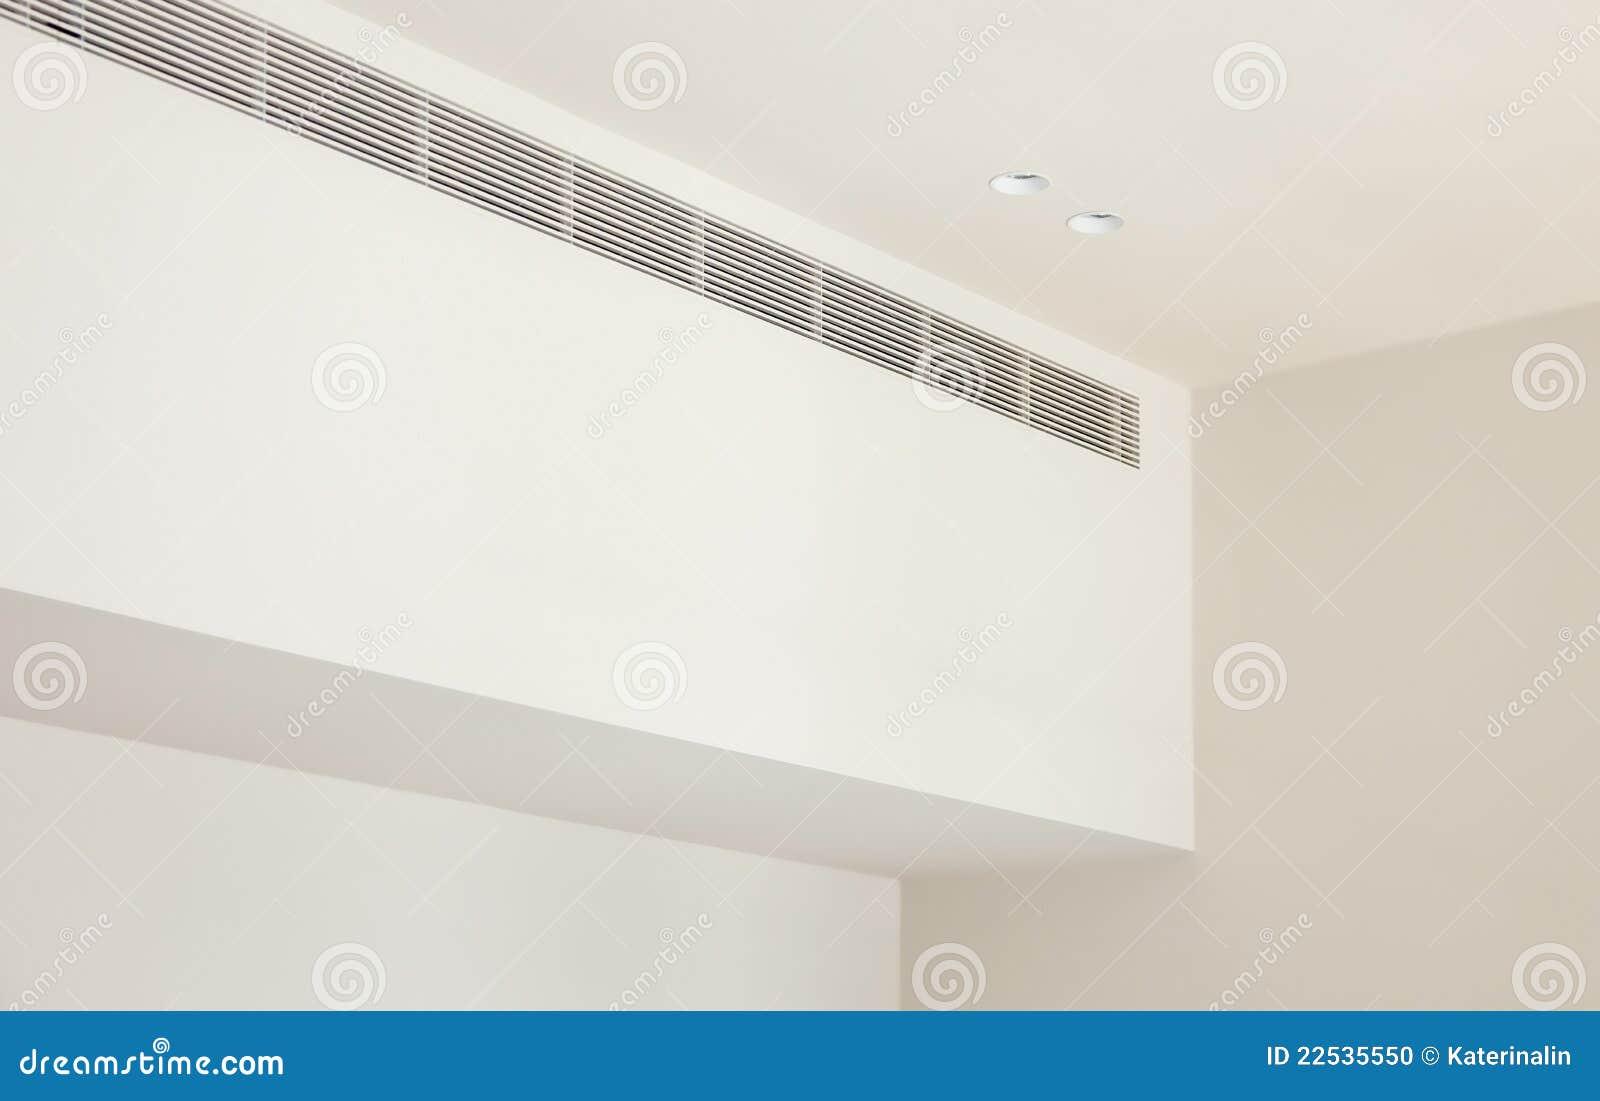 plafond de pl tre de bureau photo stock image 22535550. Black Bedroom Furniture Sets. Home Design Ideas